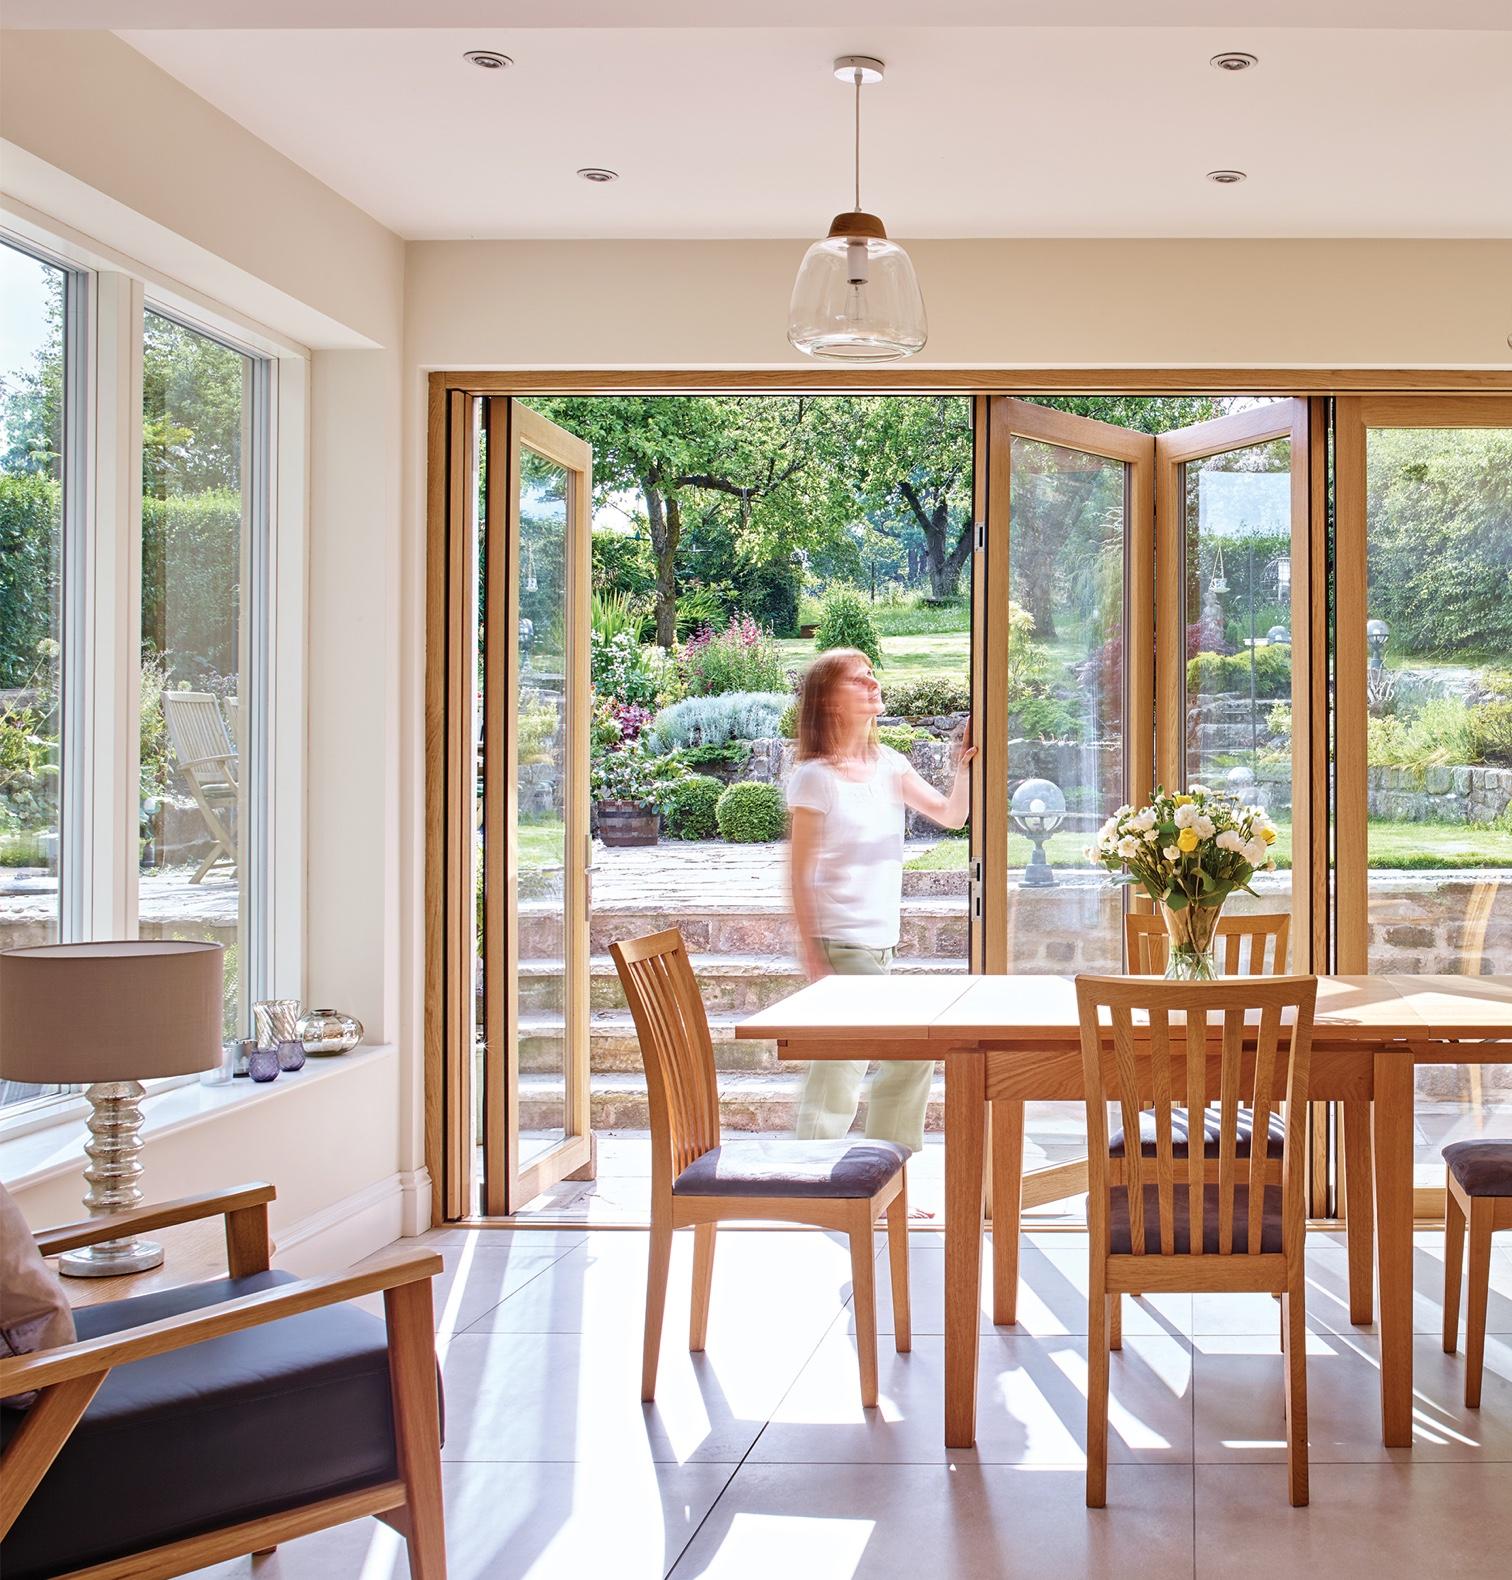 Woman opening patio door by dining room